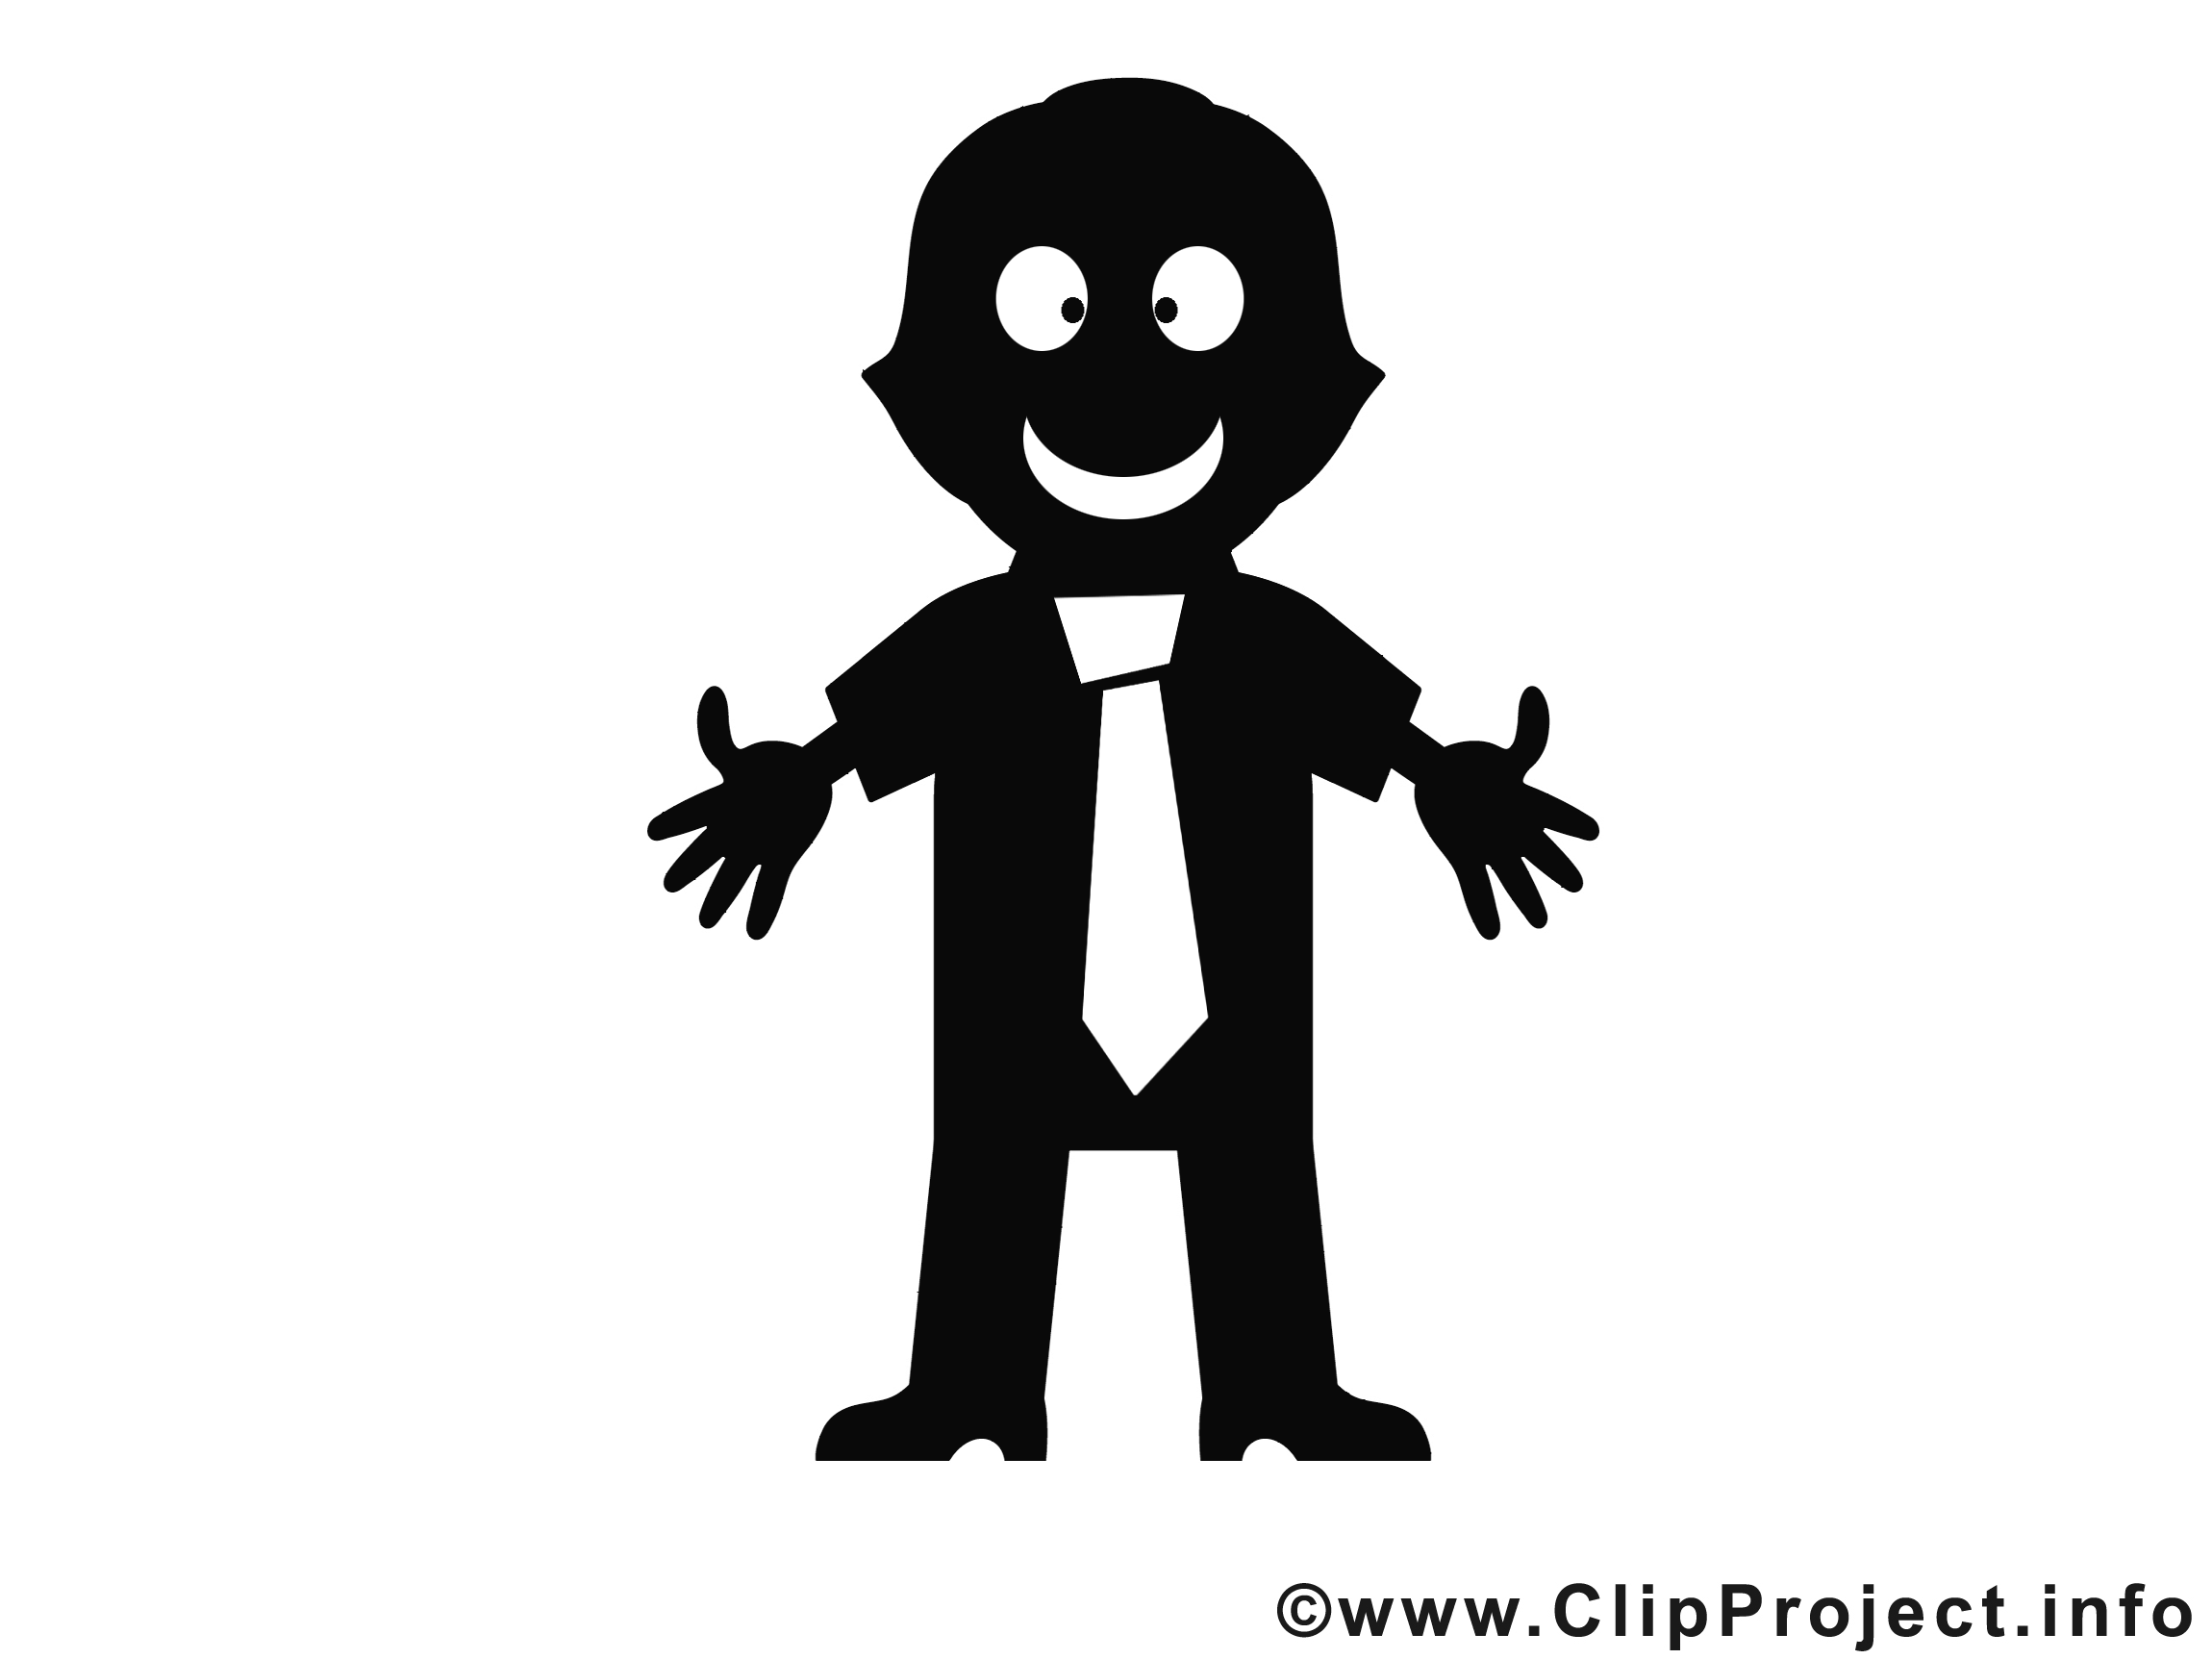 Mensch clipart 3 » Clipart Station.